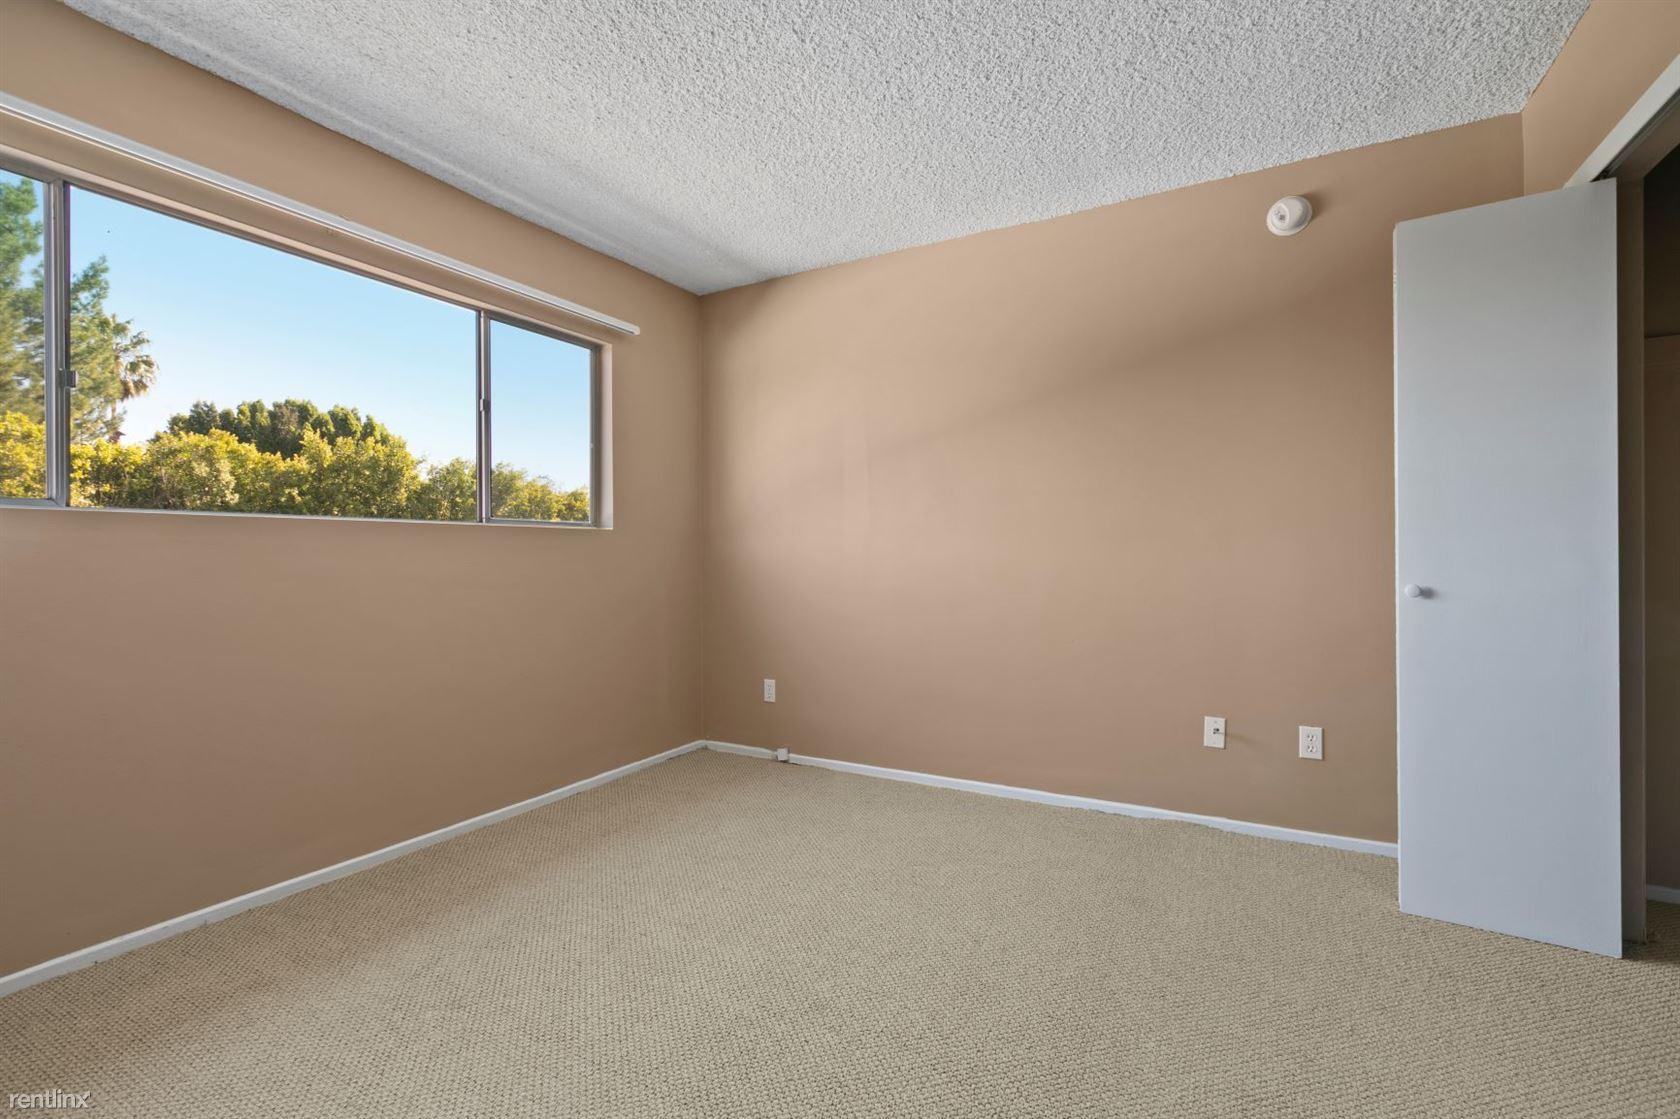 5140 White Oak Ave - 2605USD / month